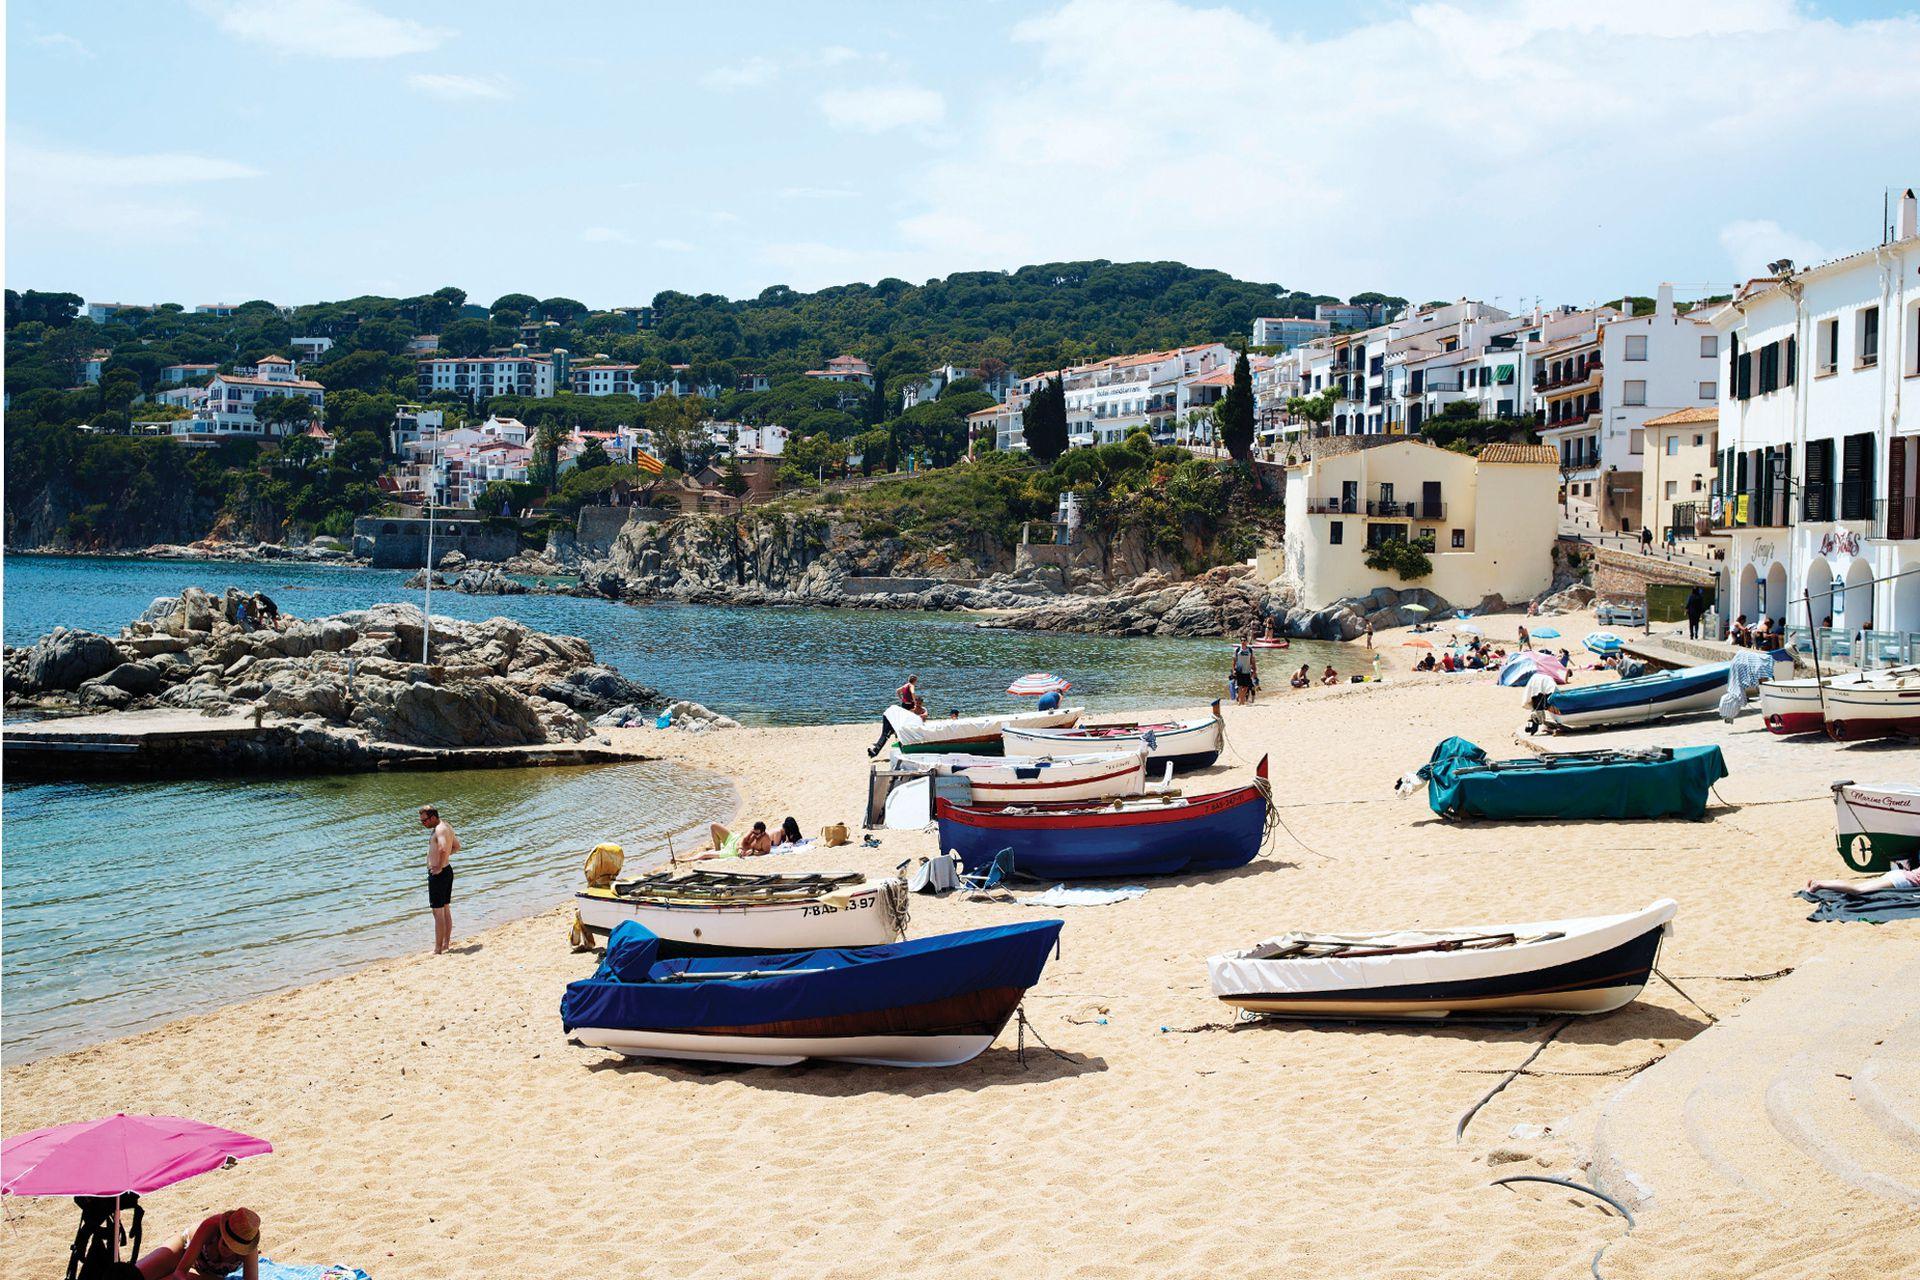 Mediterráneo Da Capo se denomina la gira mundial en la que honra al gran disco de 1971